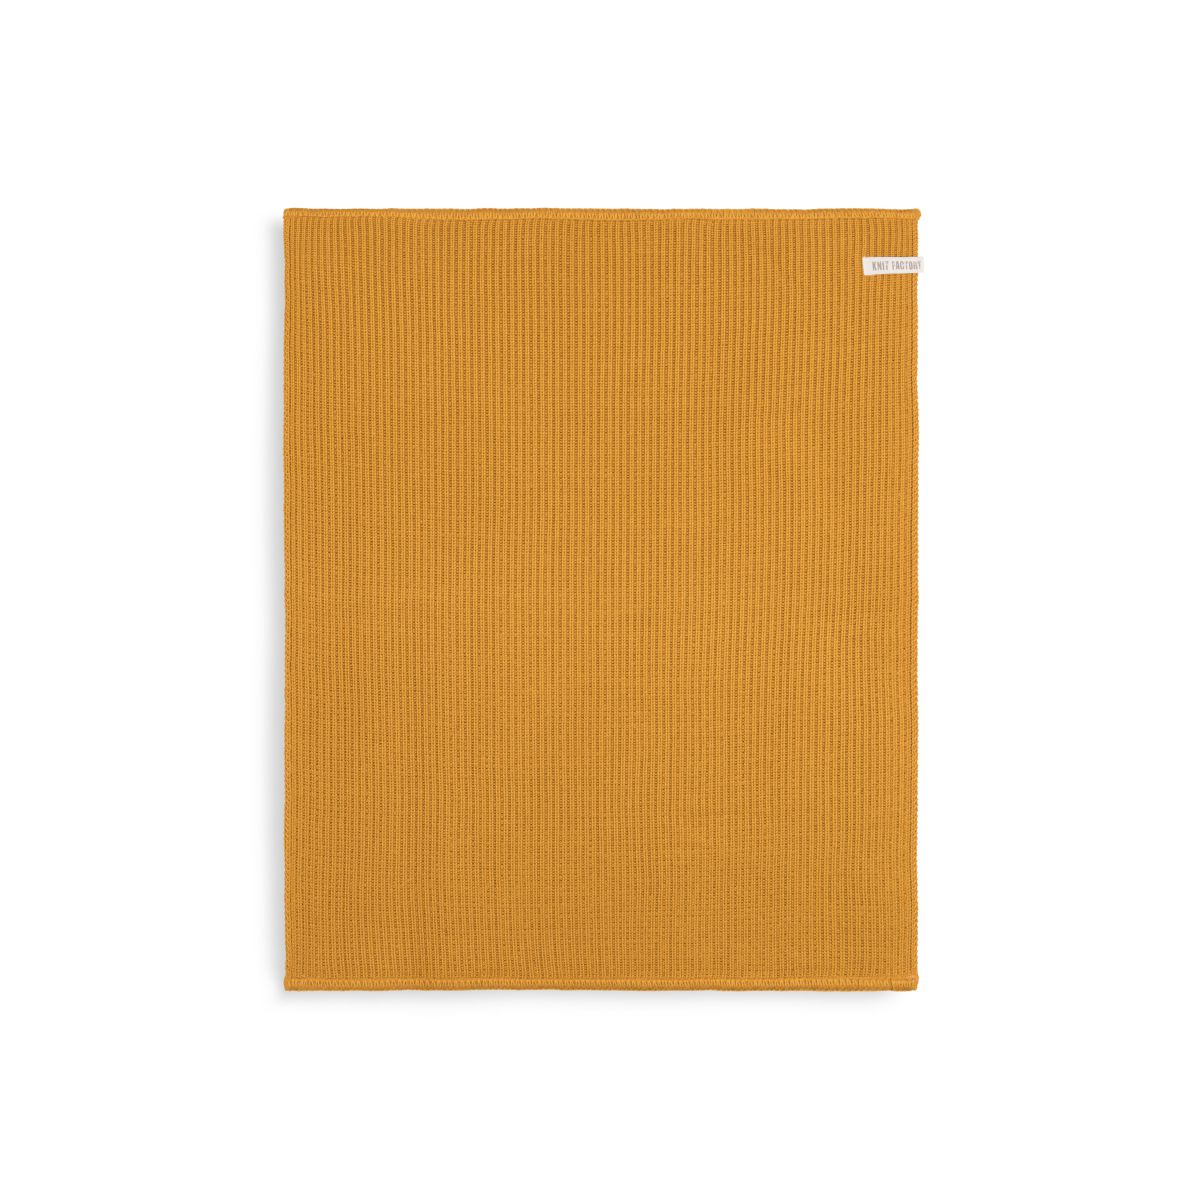 knit factory kf20322801750 badmat morres oker 60x50 1